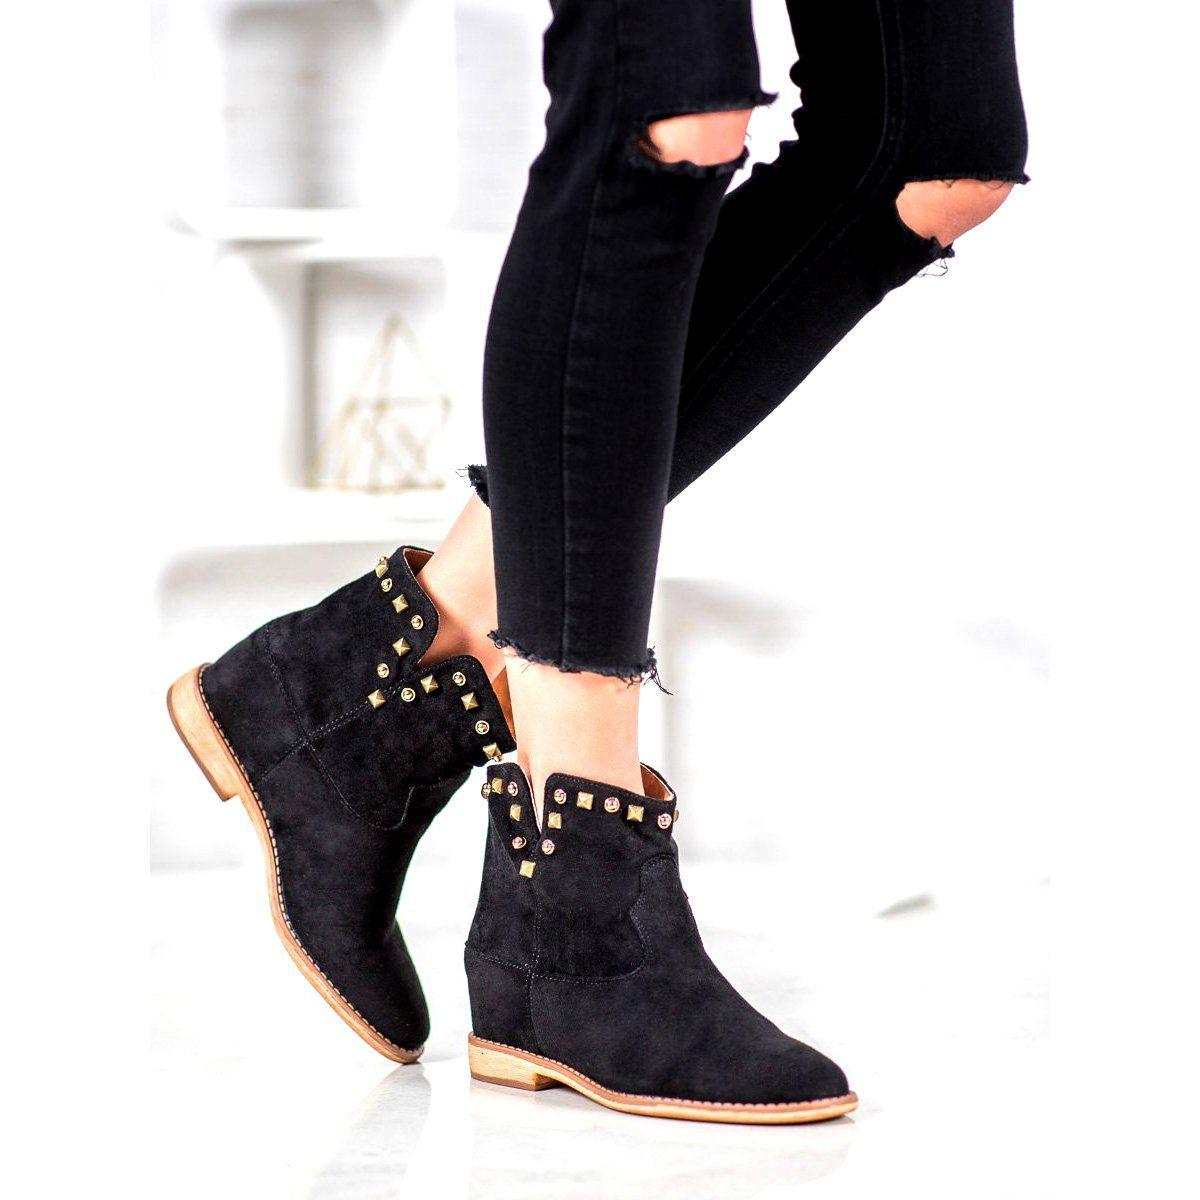 Bella Paris Kowbojki Z Dzetami Czarne Black Boots Women Boots Boot Shoes Women